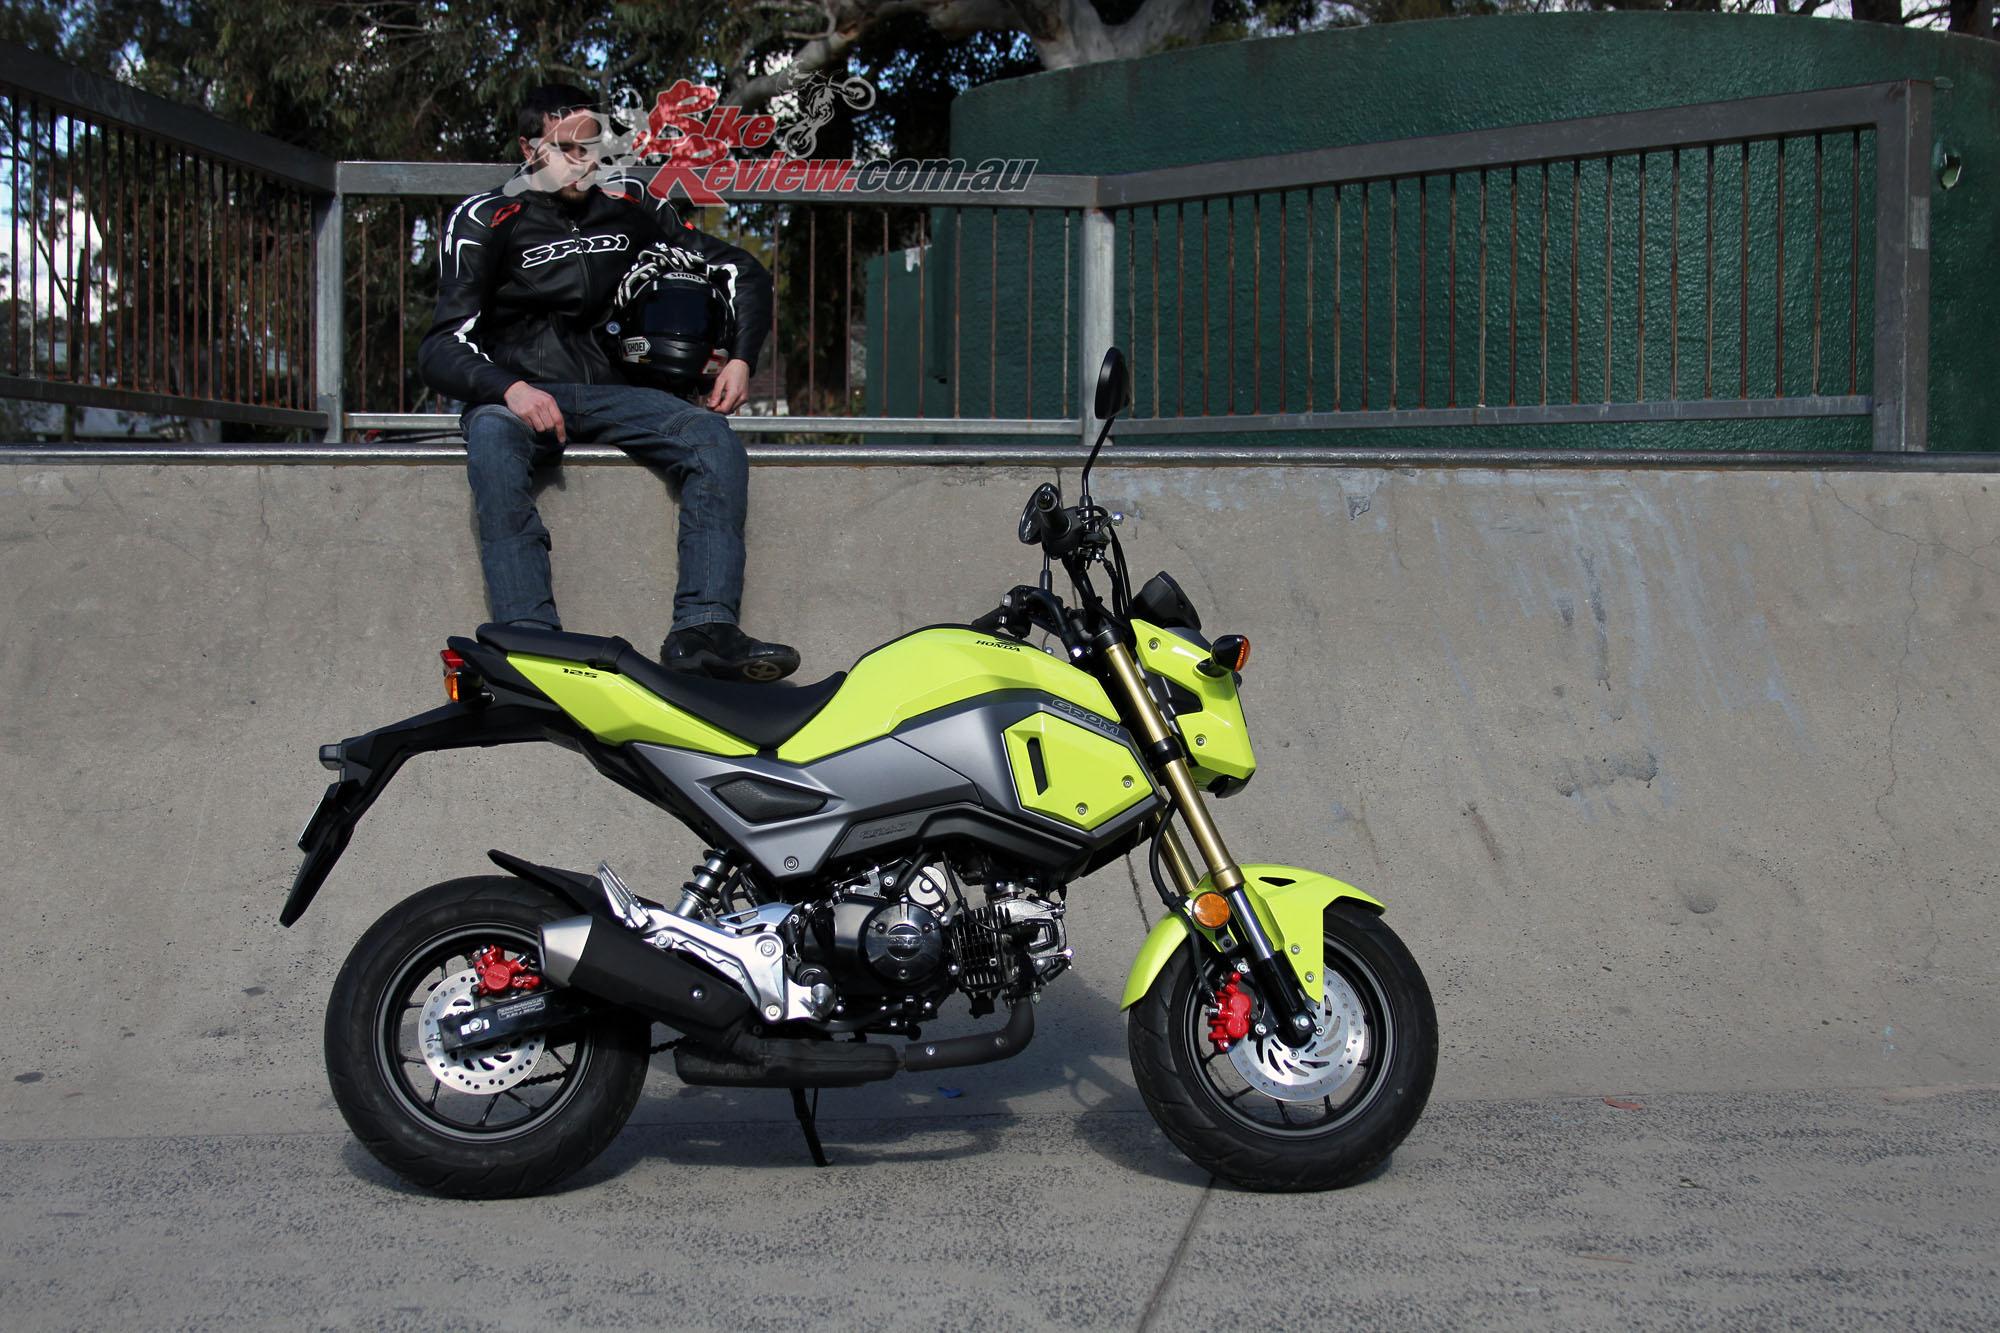 Honda Grom Review >> Grom Christmas Ride Away Price - Bike Review